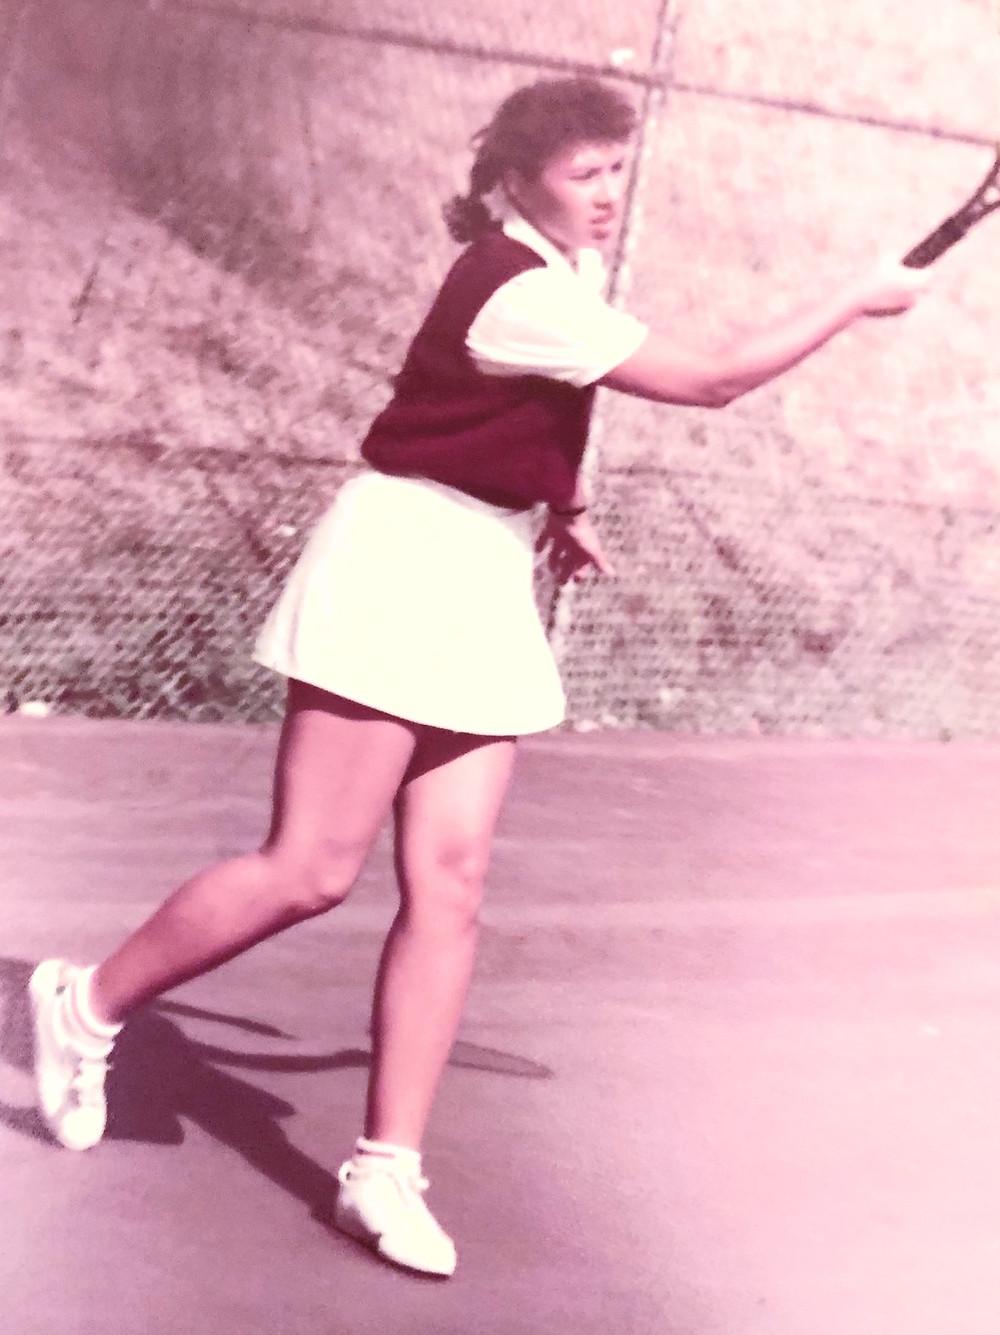 Tida Chambers playing tennis